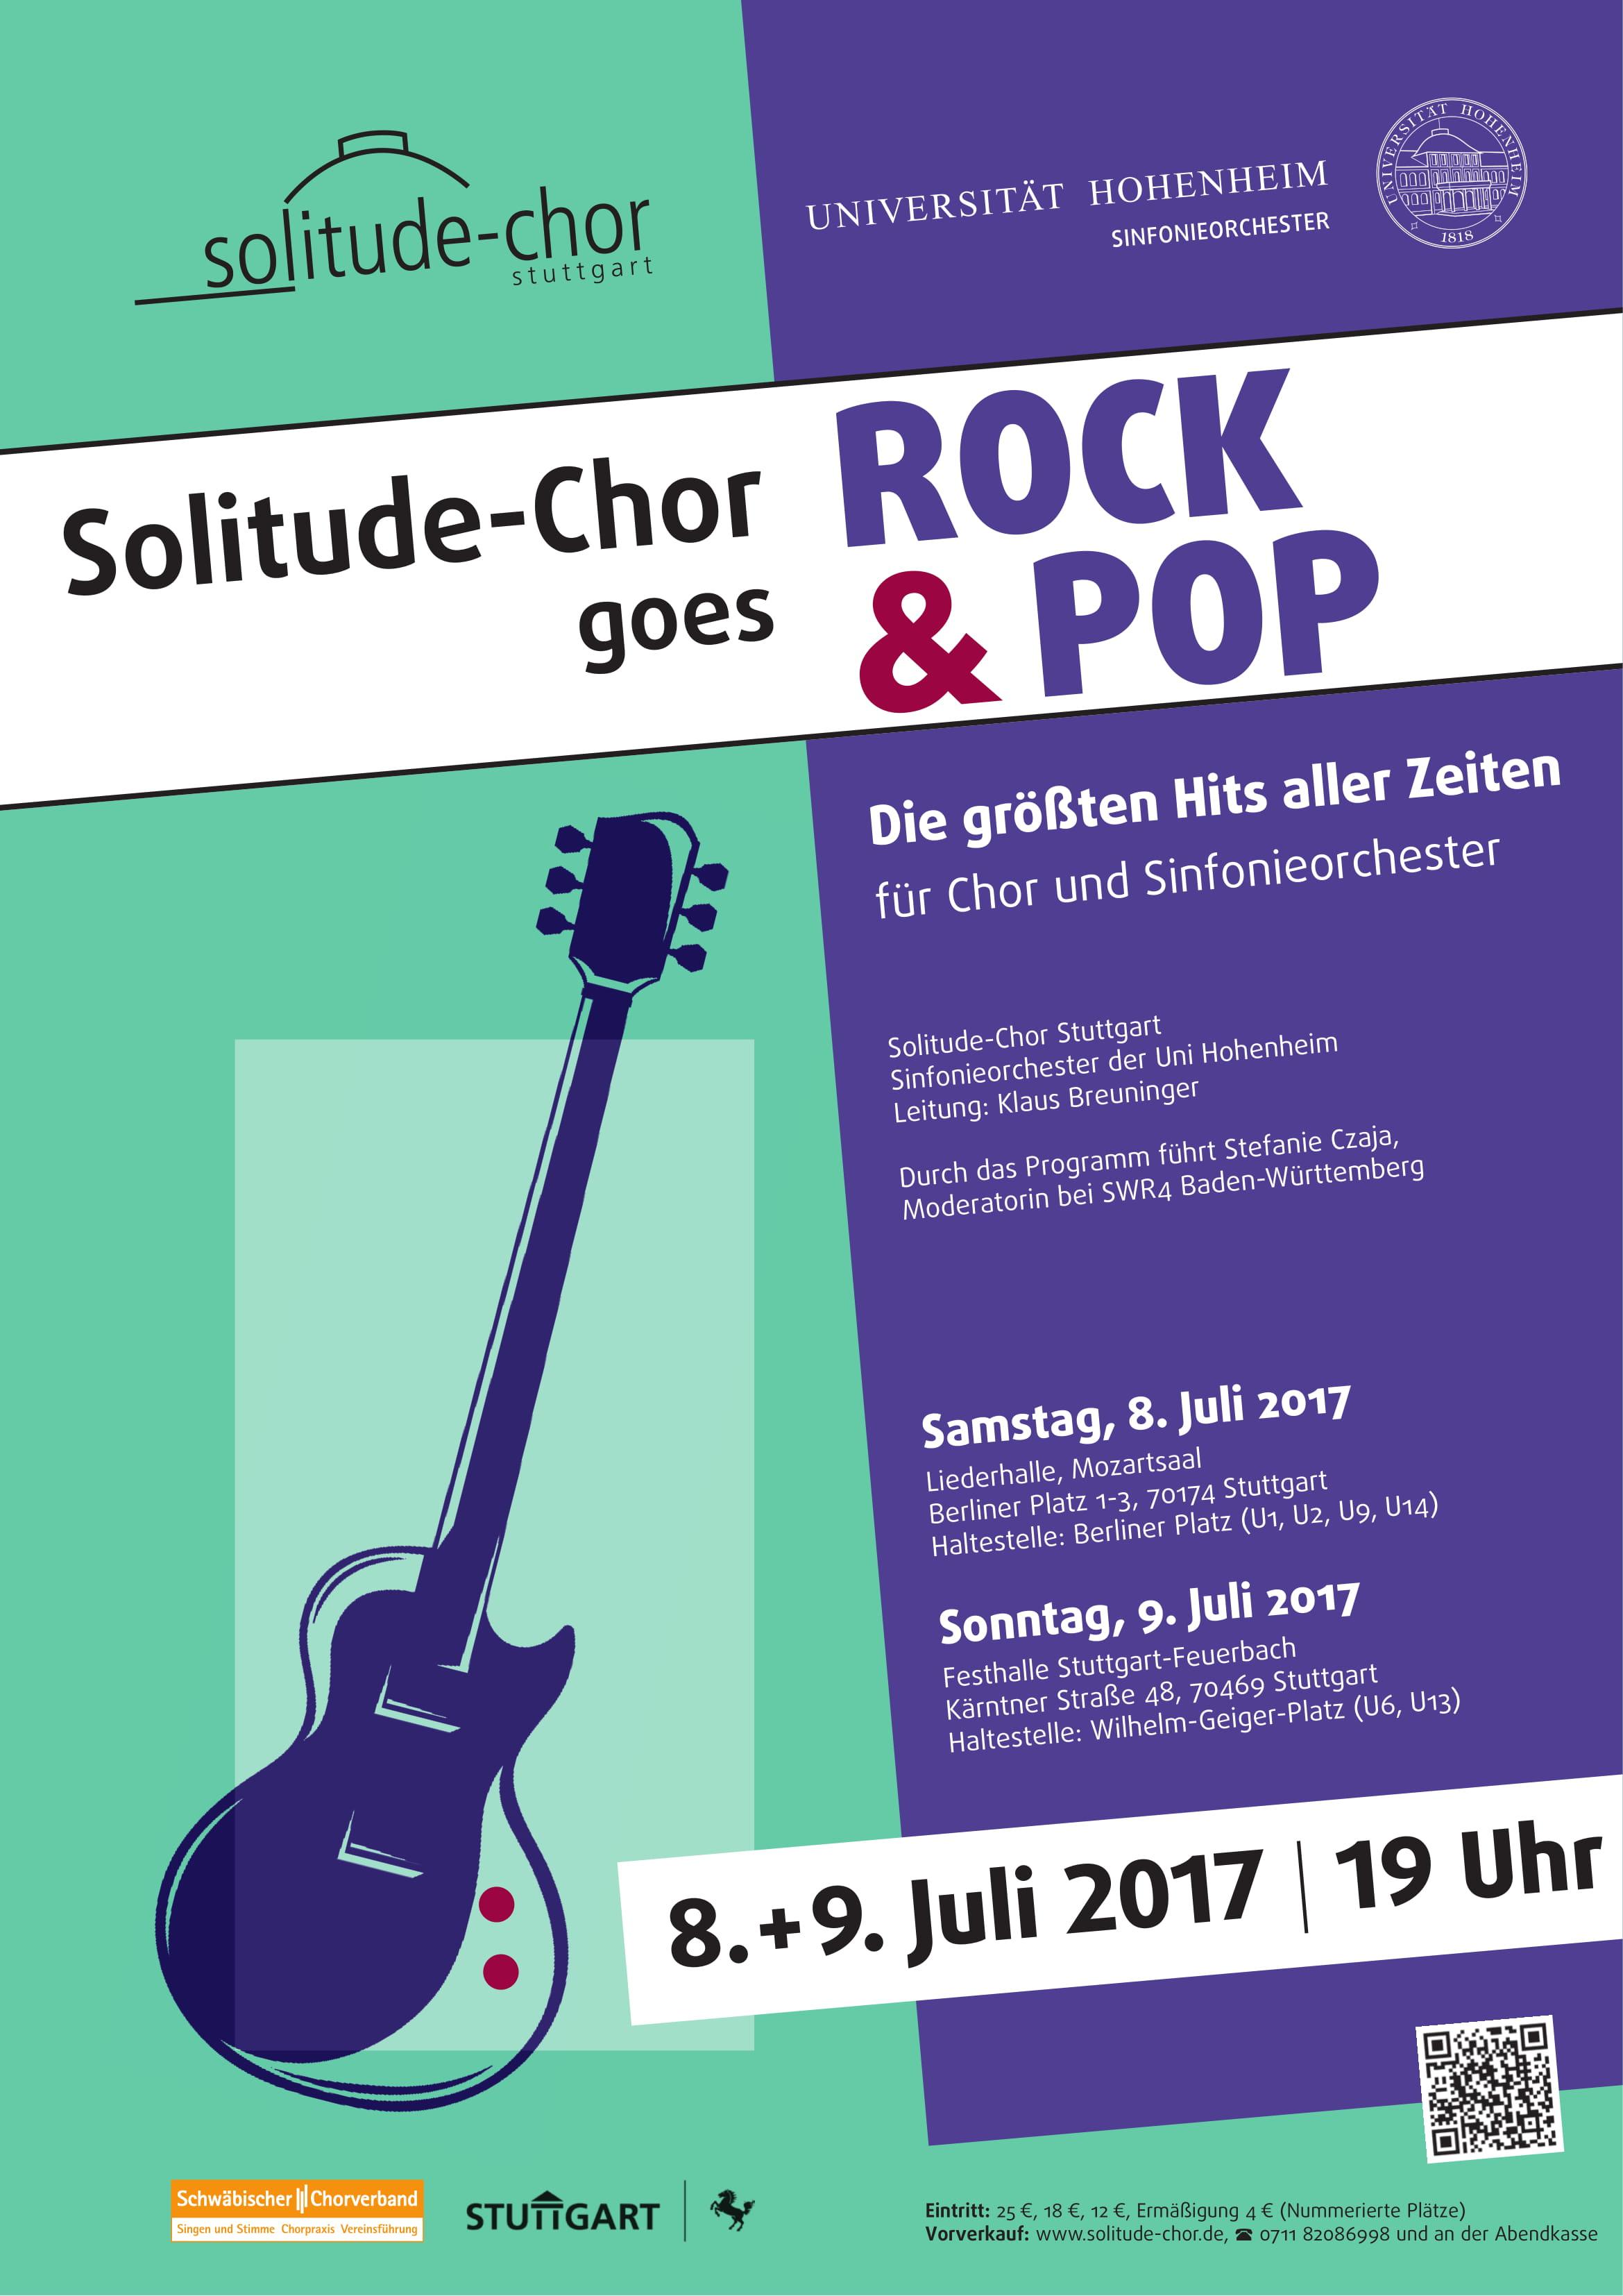 Solitude-Chor rockt!